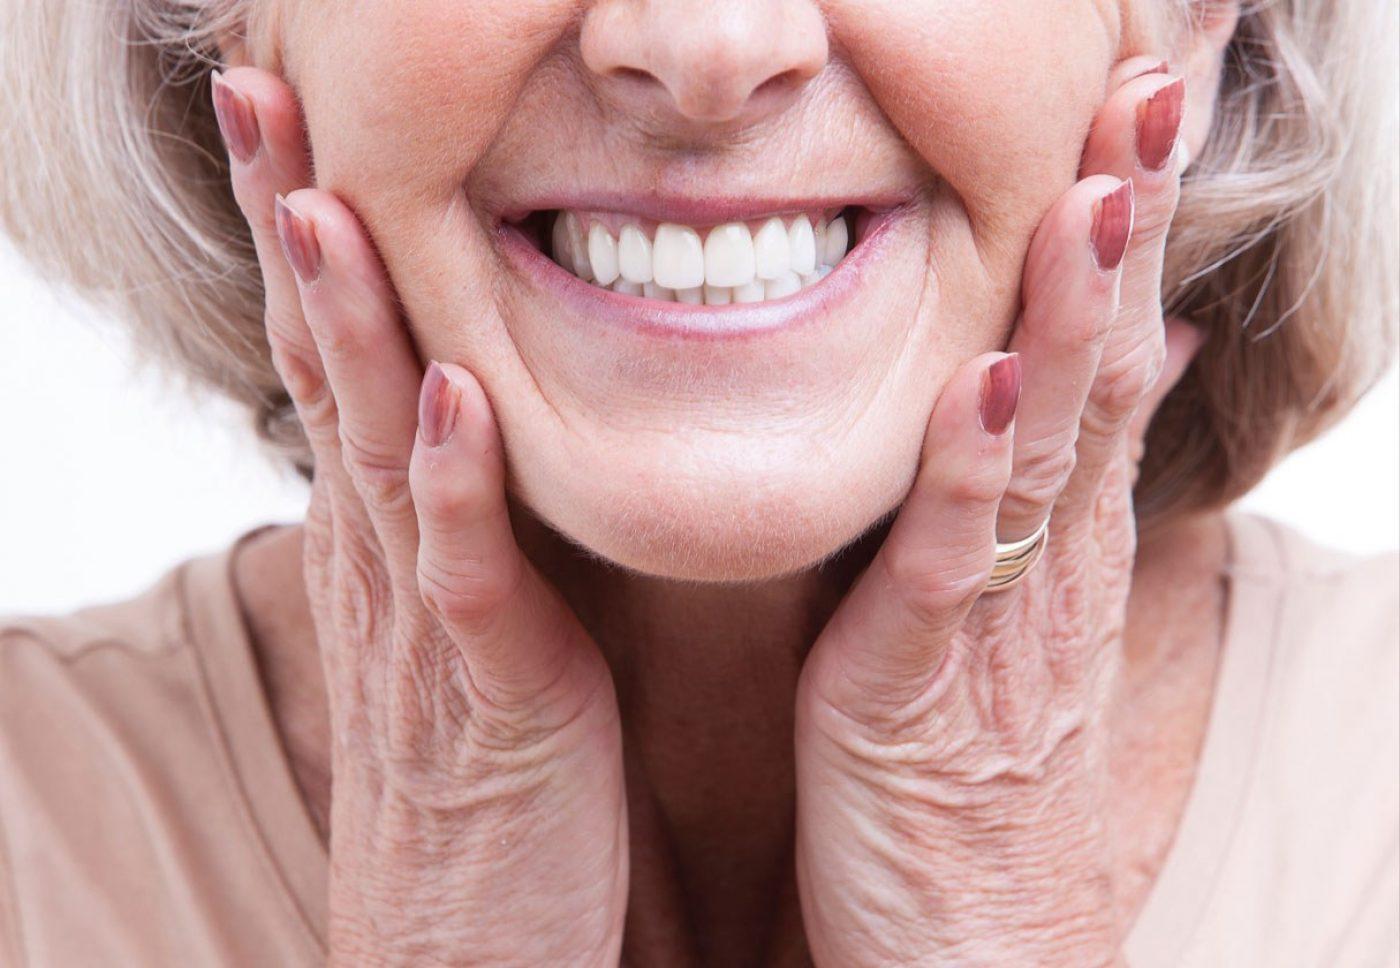 glasgow Replacing Teeth Dentures